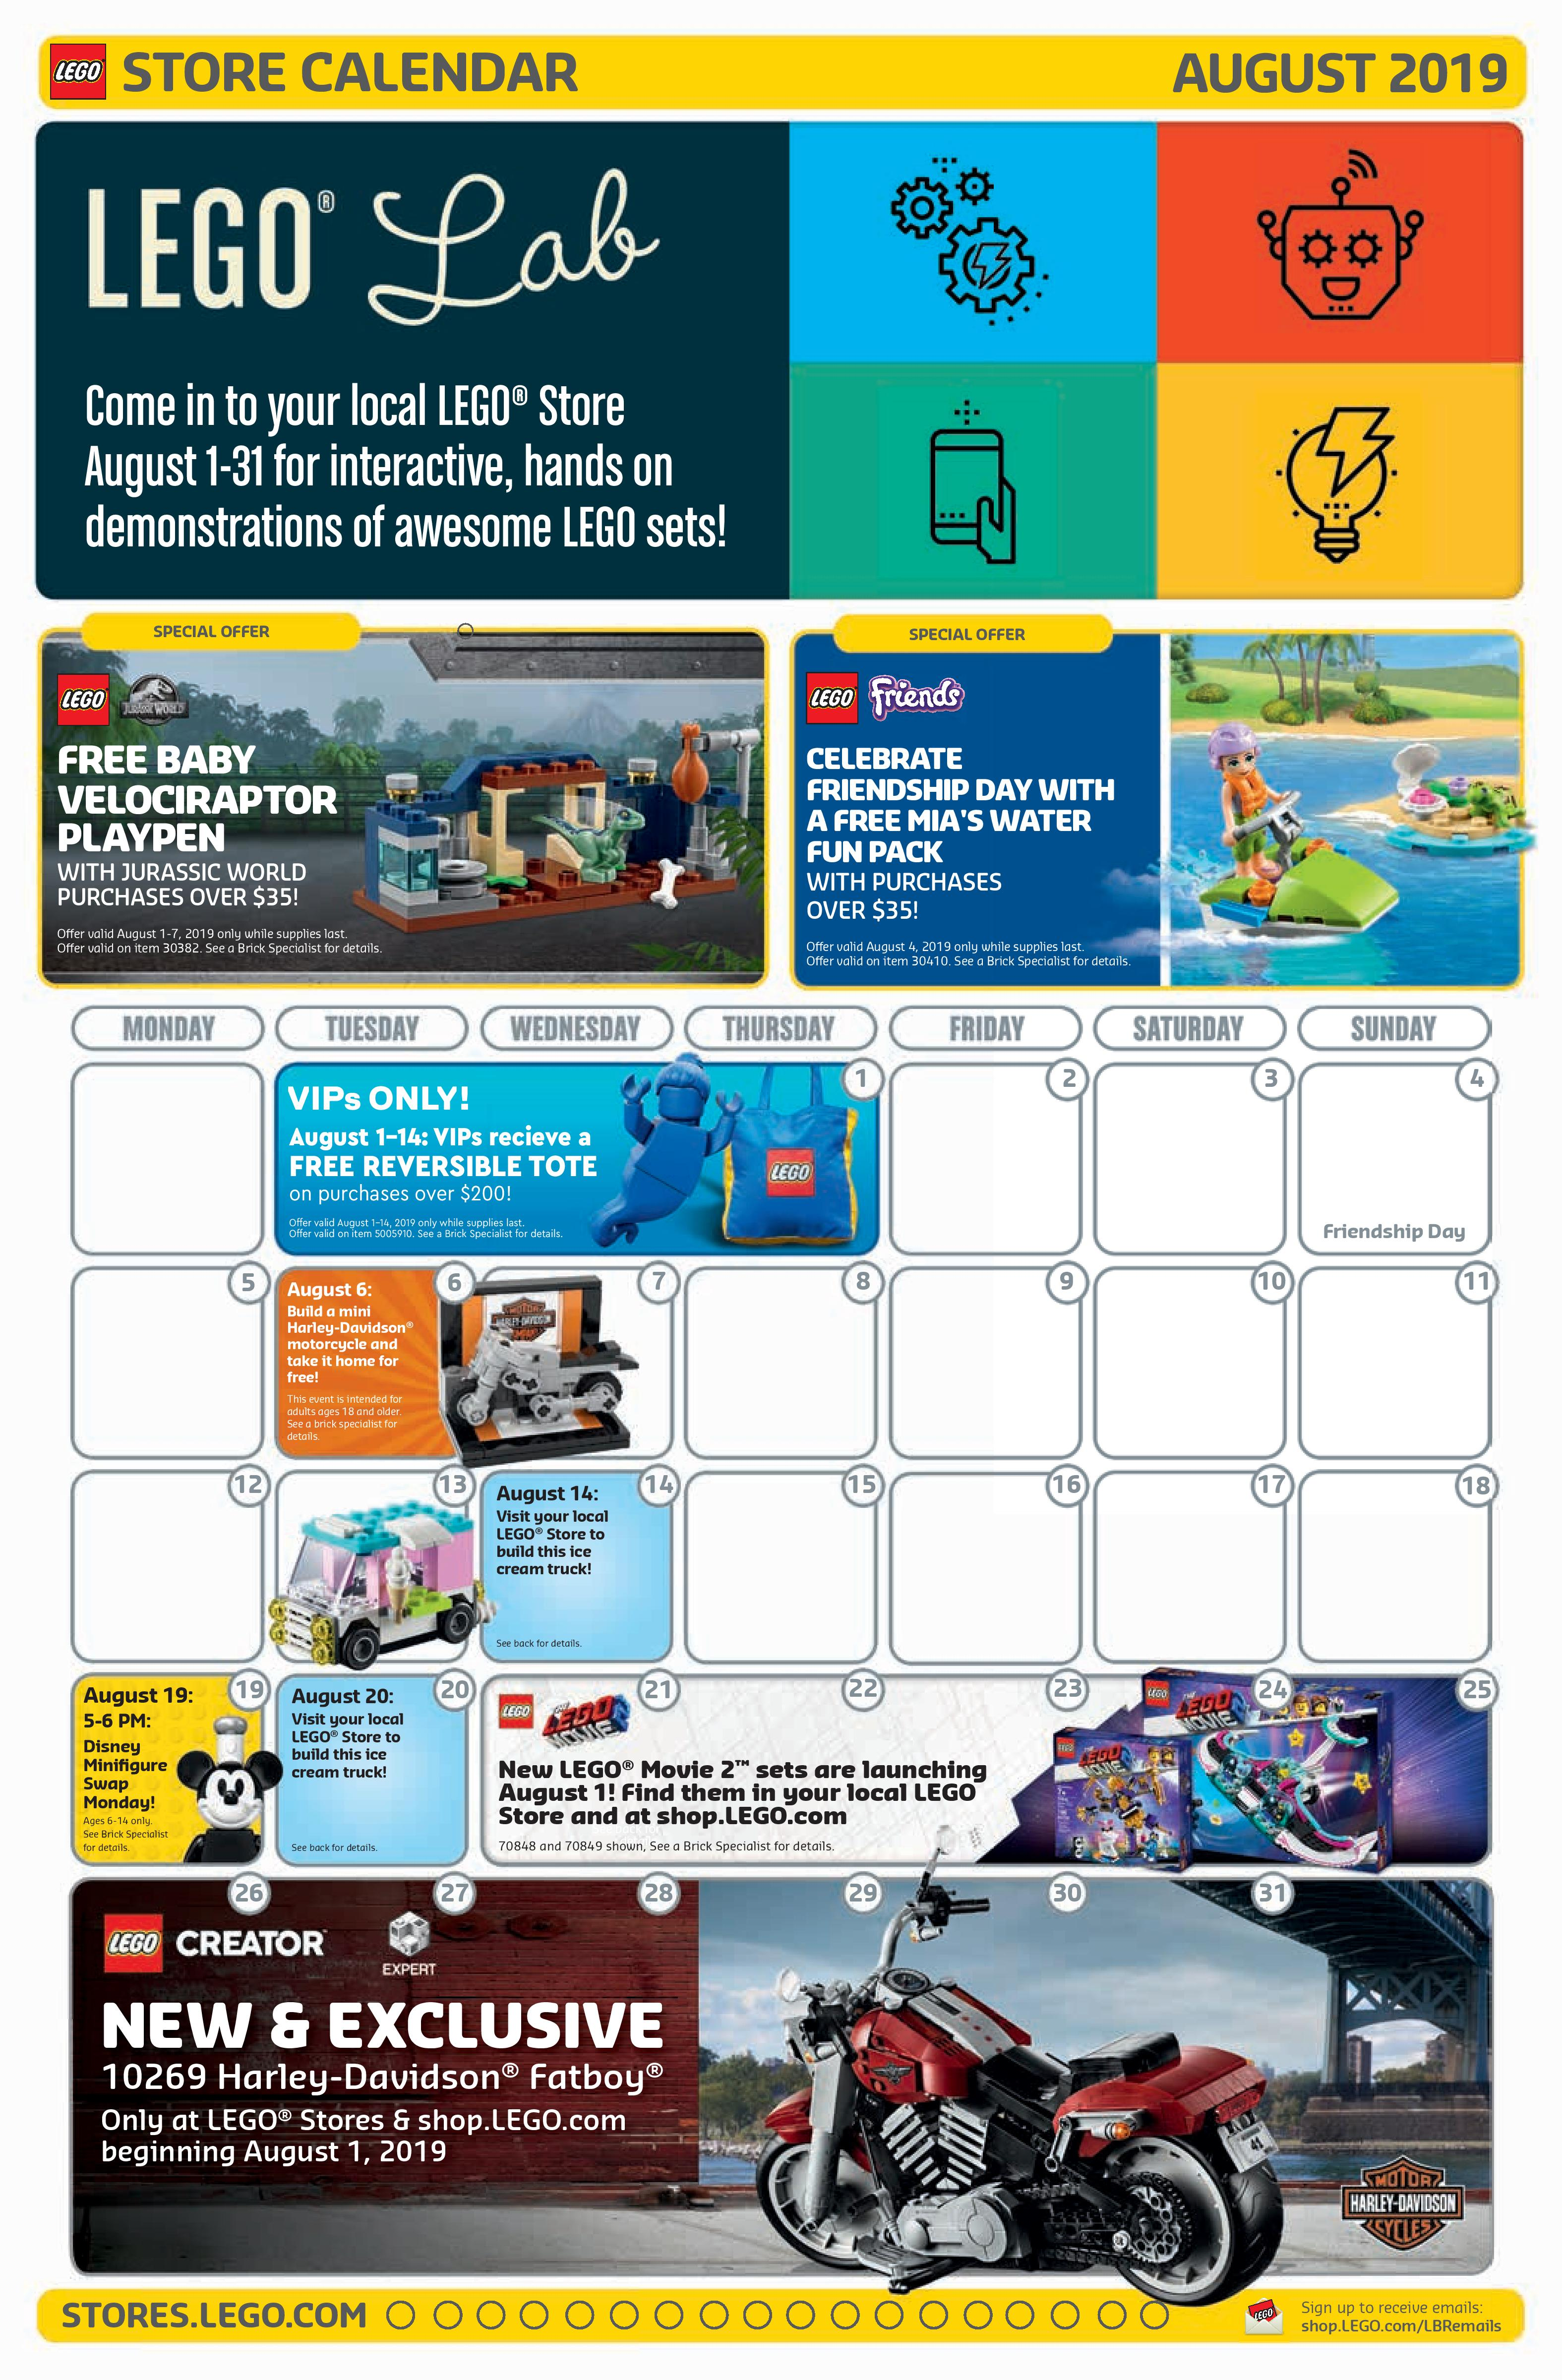 Lego August 2020 Calendar The Brick Fan's CV | ClearVoice Content Portfolio